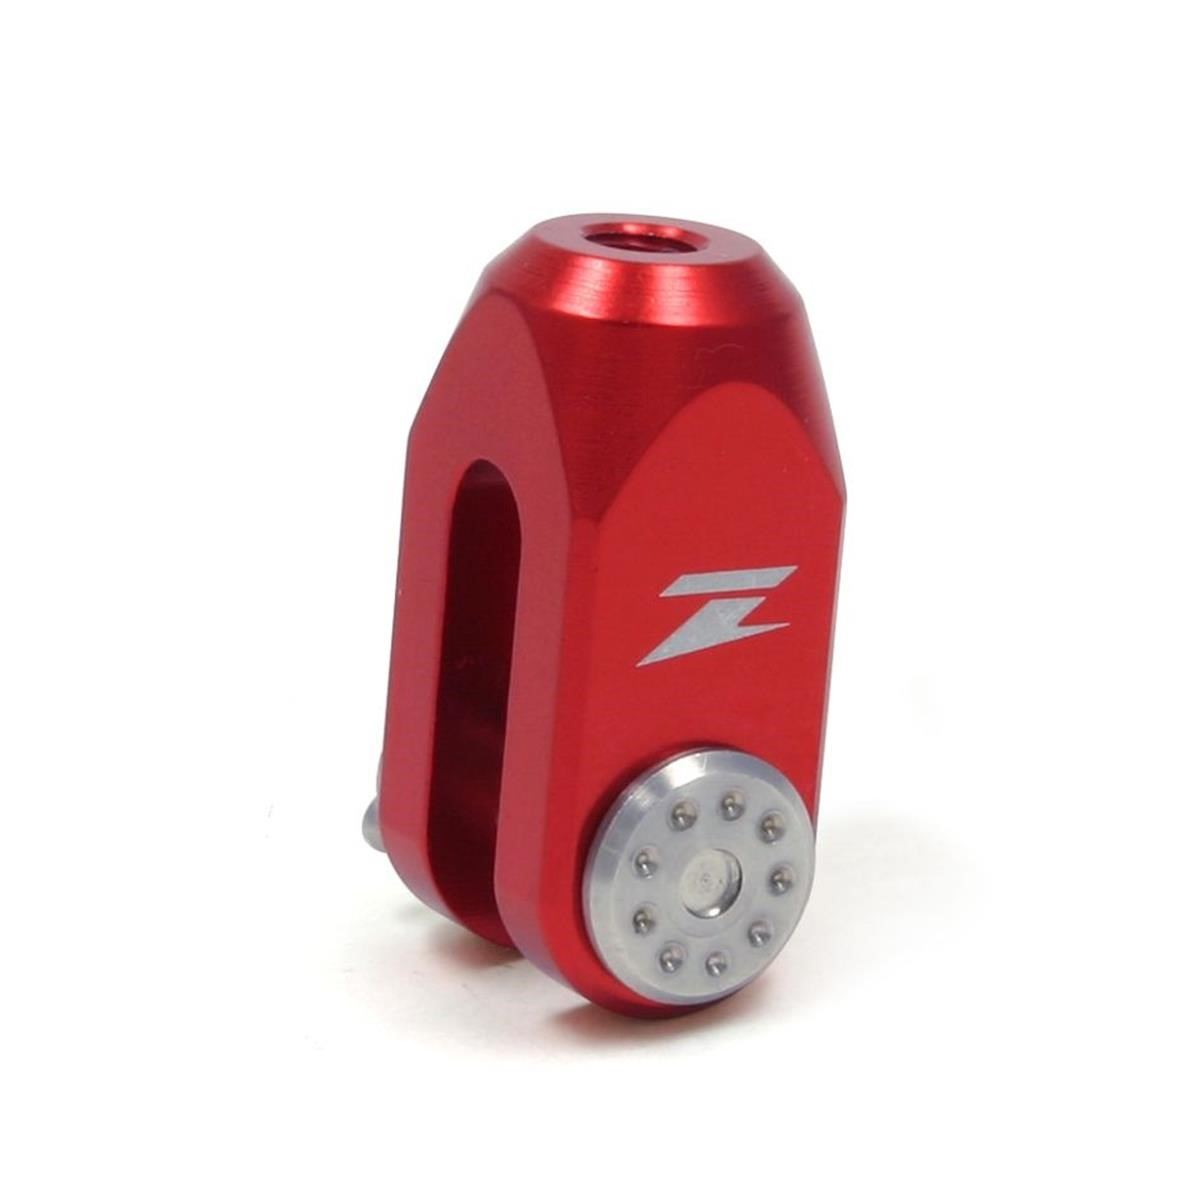 Zeta Hinterradbremsen-Einsteller  Rot, Yamaha YZ 80/85 94-17